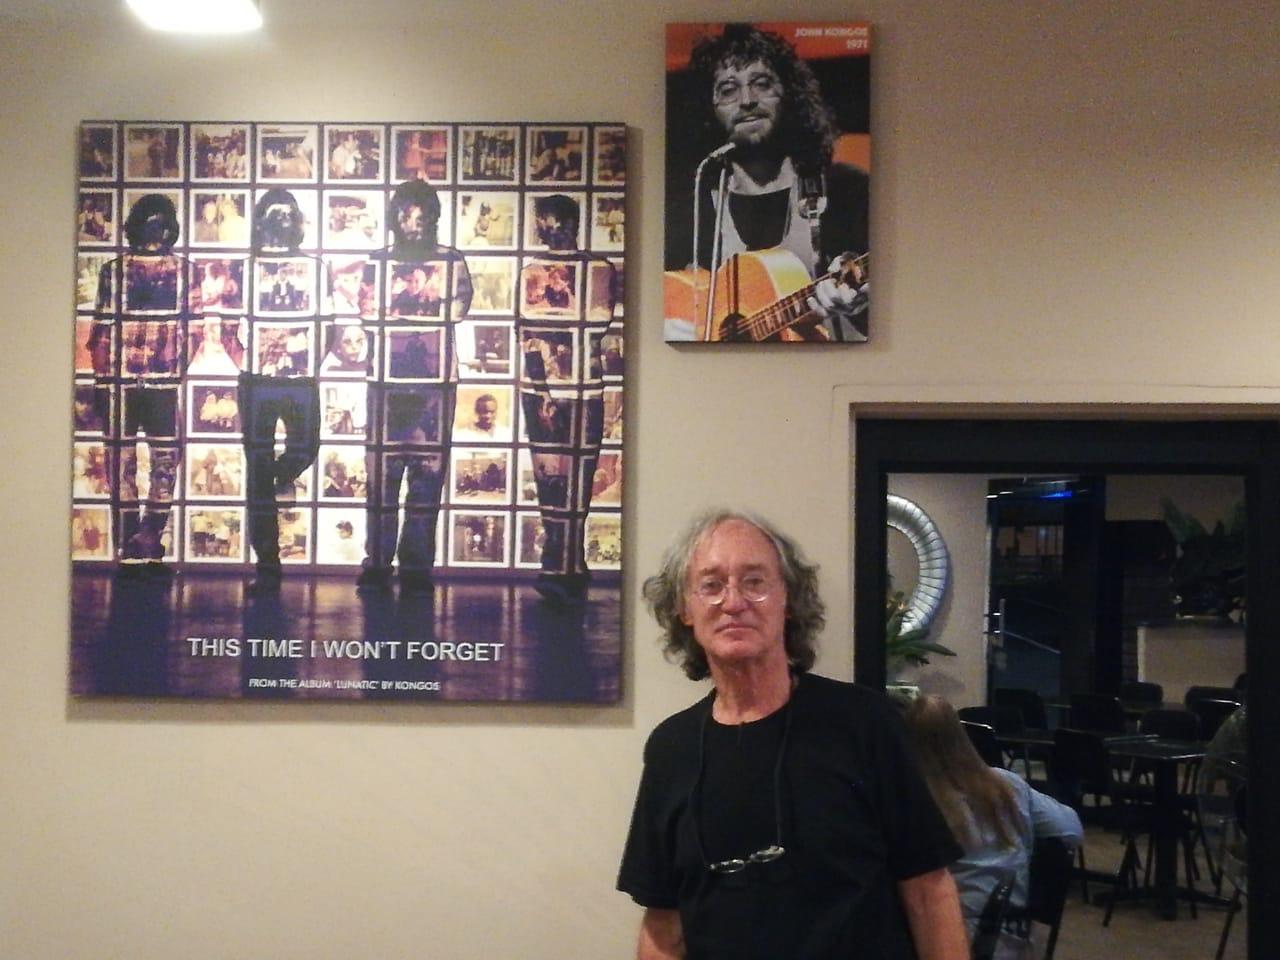 IMG_2947 - JOHN IN KONGOS CORNER copy.jpg